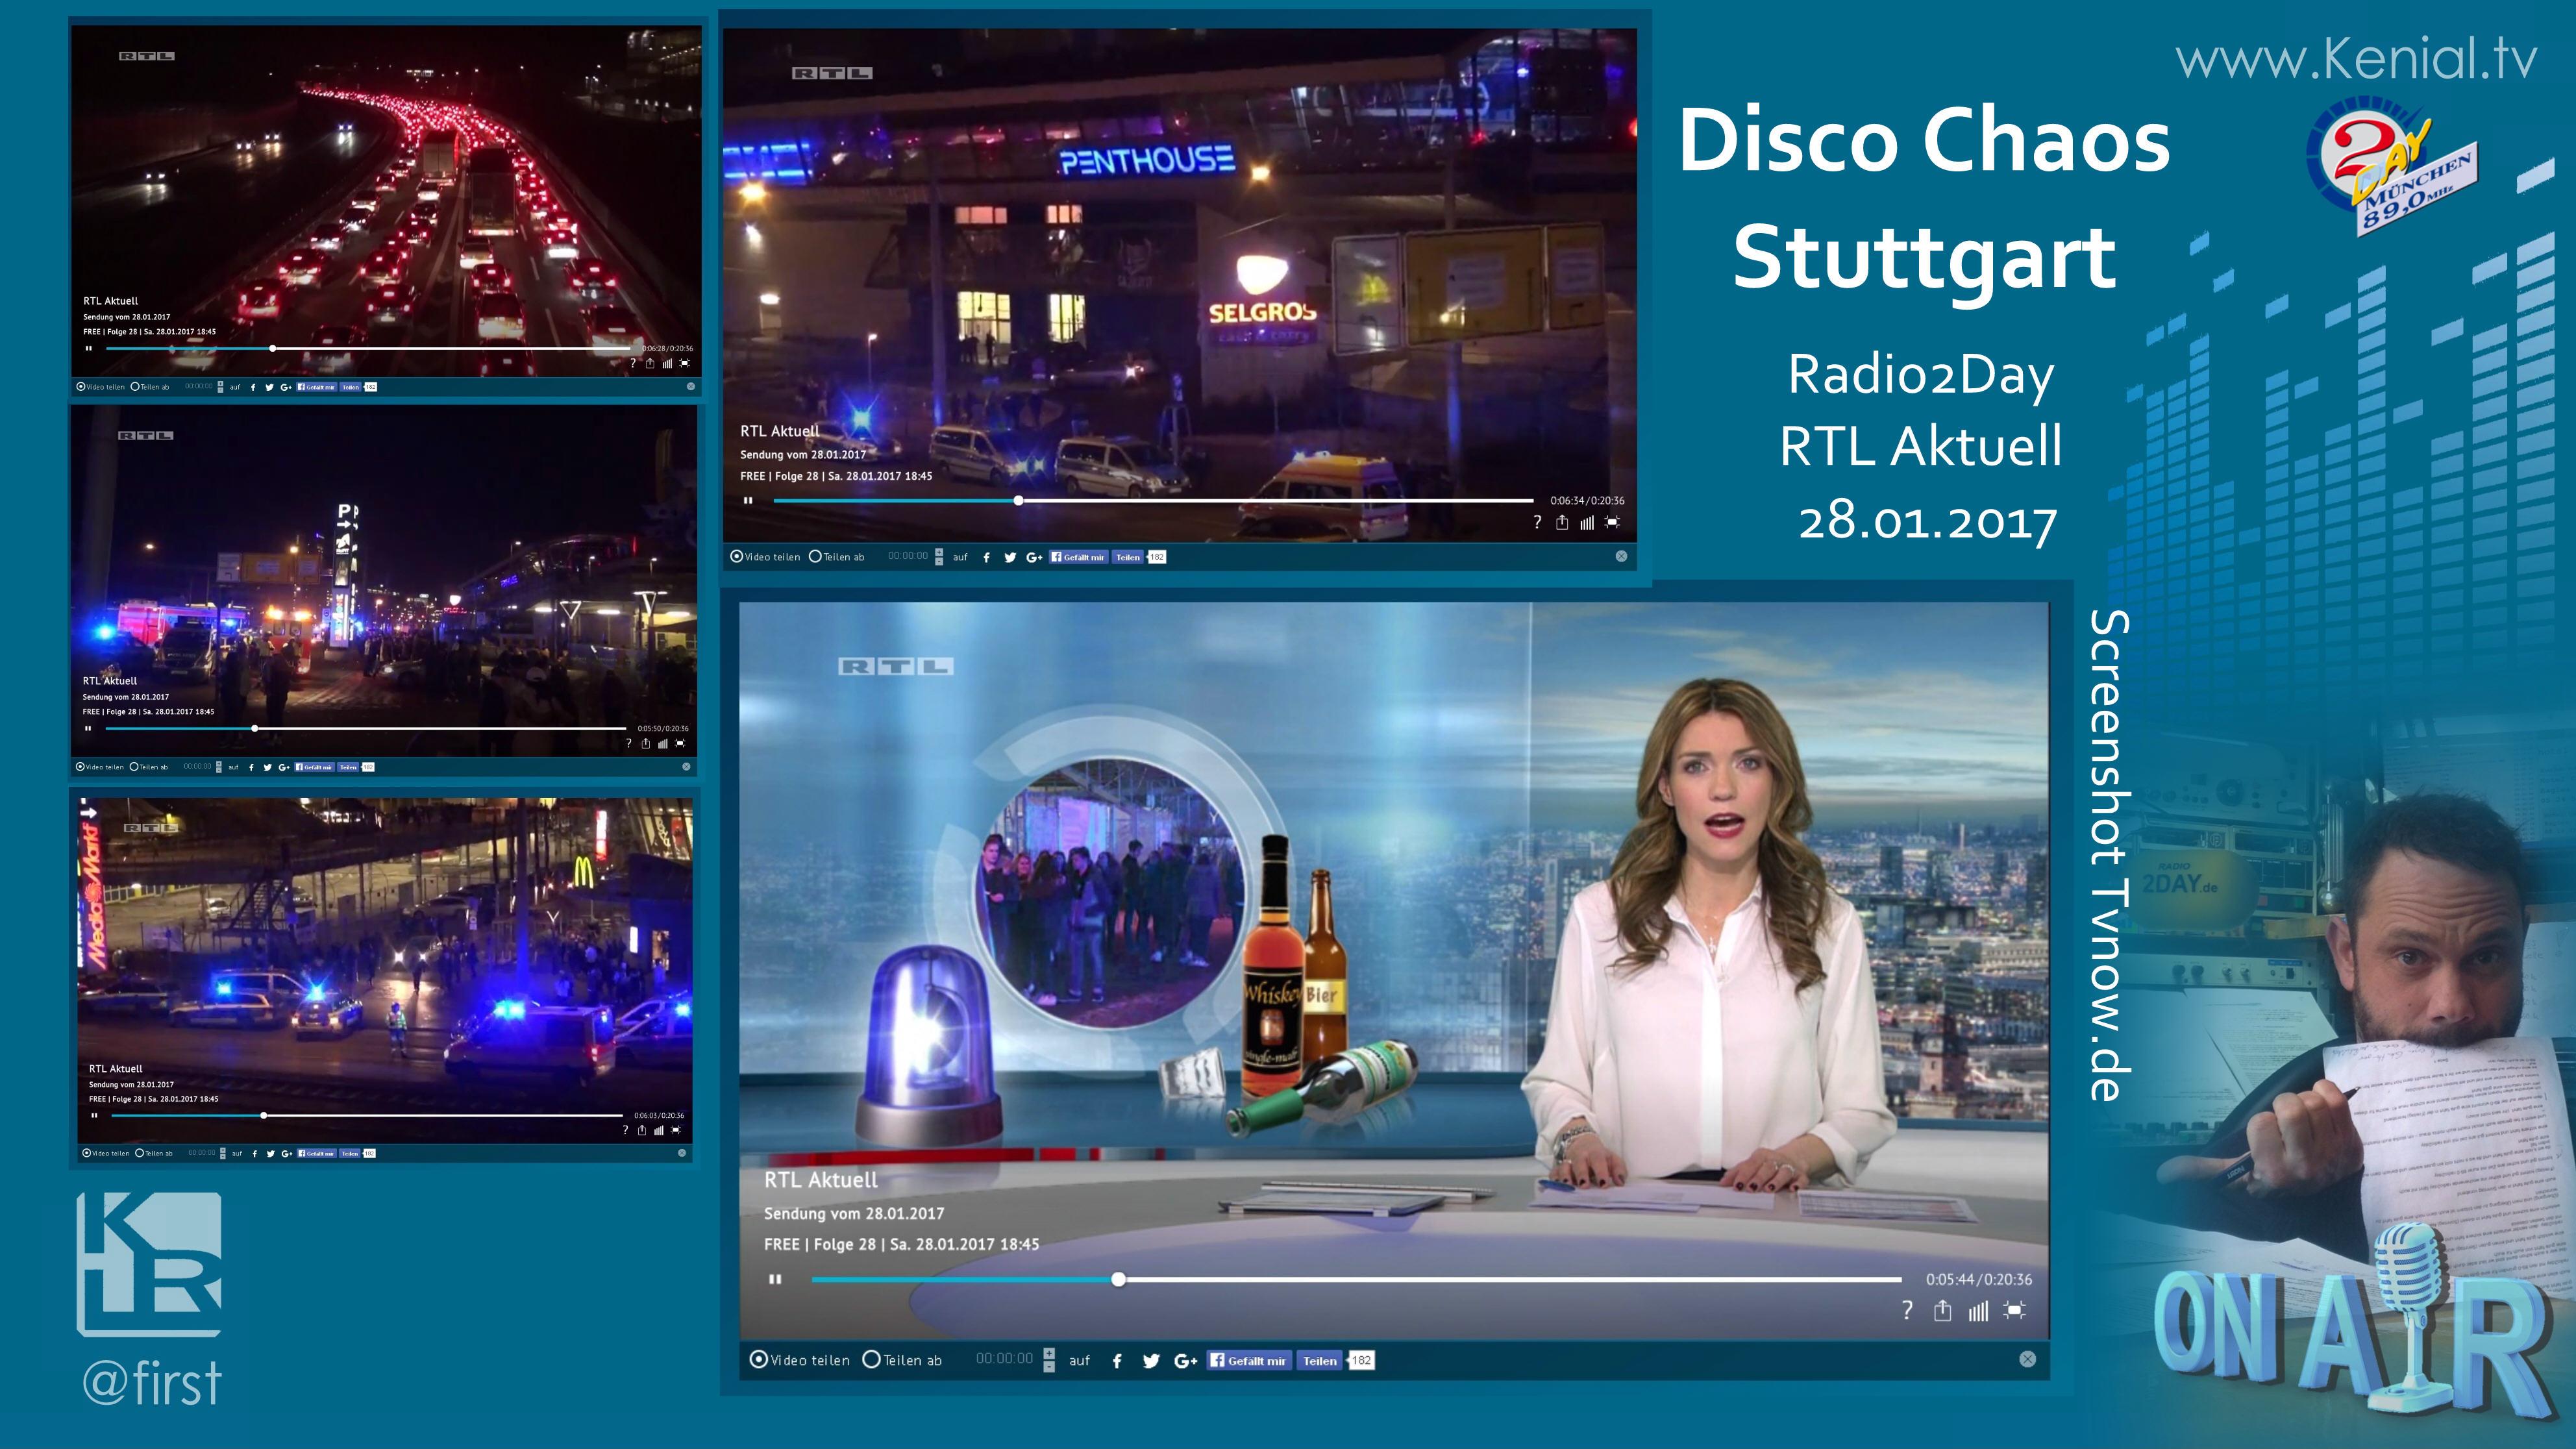 Disco Chaos in Stuttgart